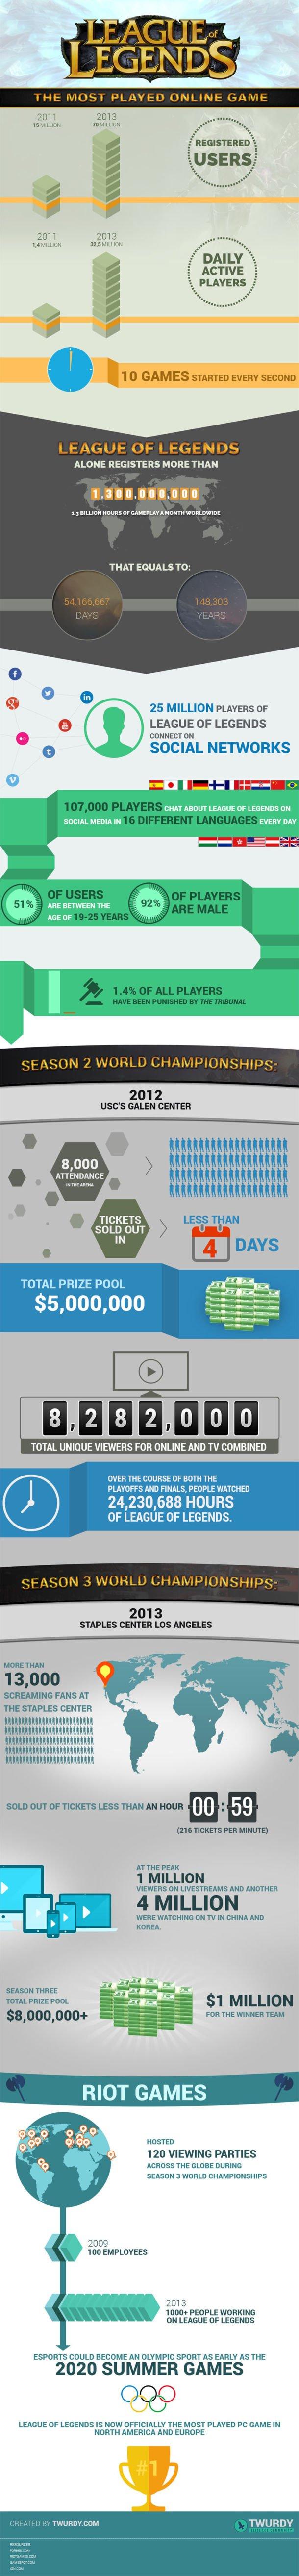 league_of_legends_infographic_800-610x5255